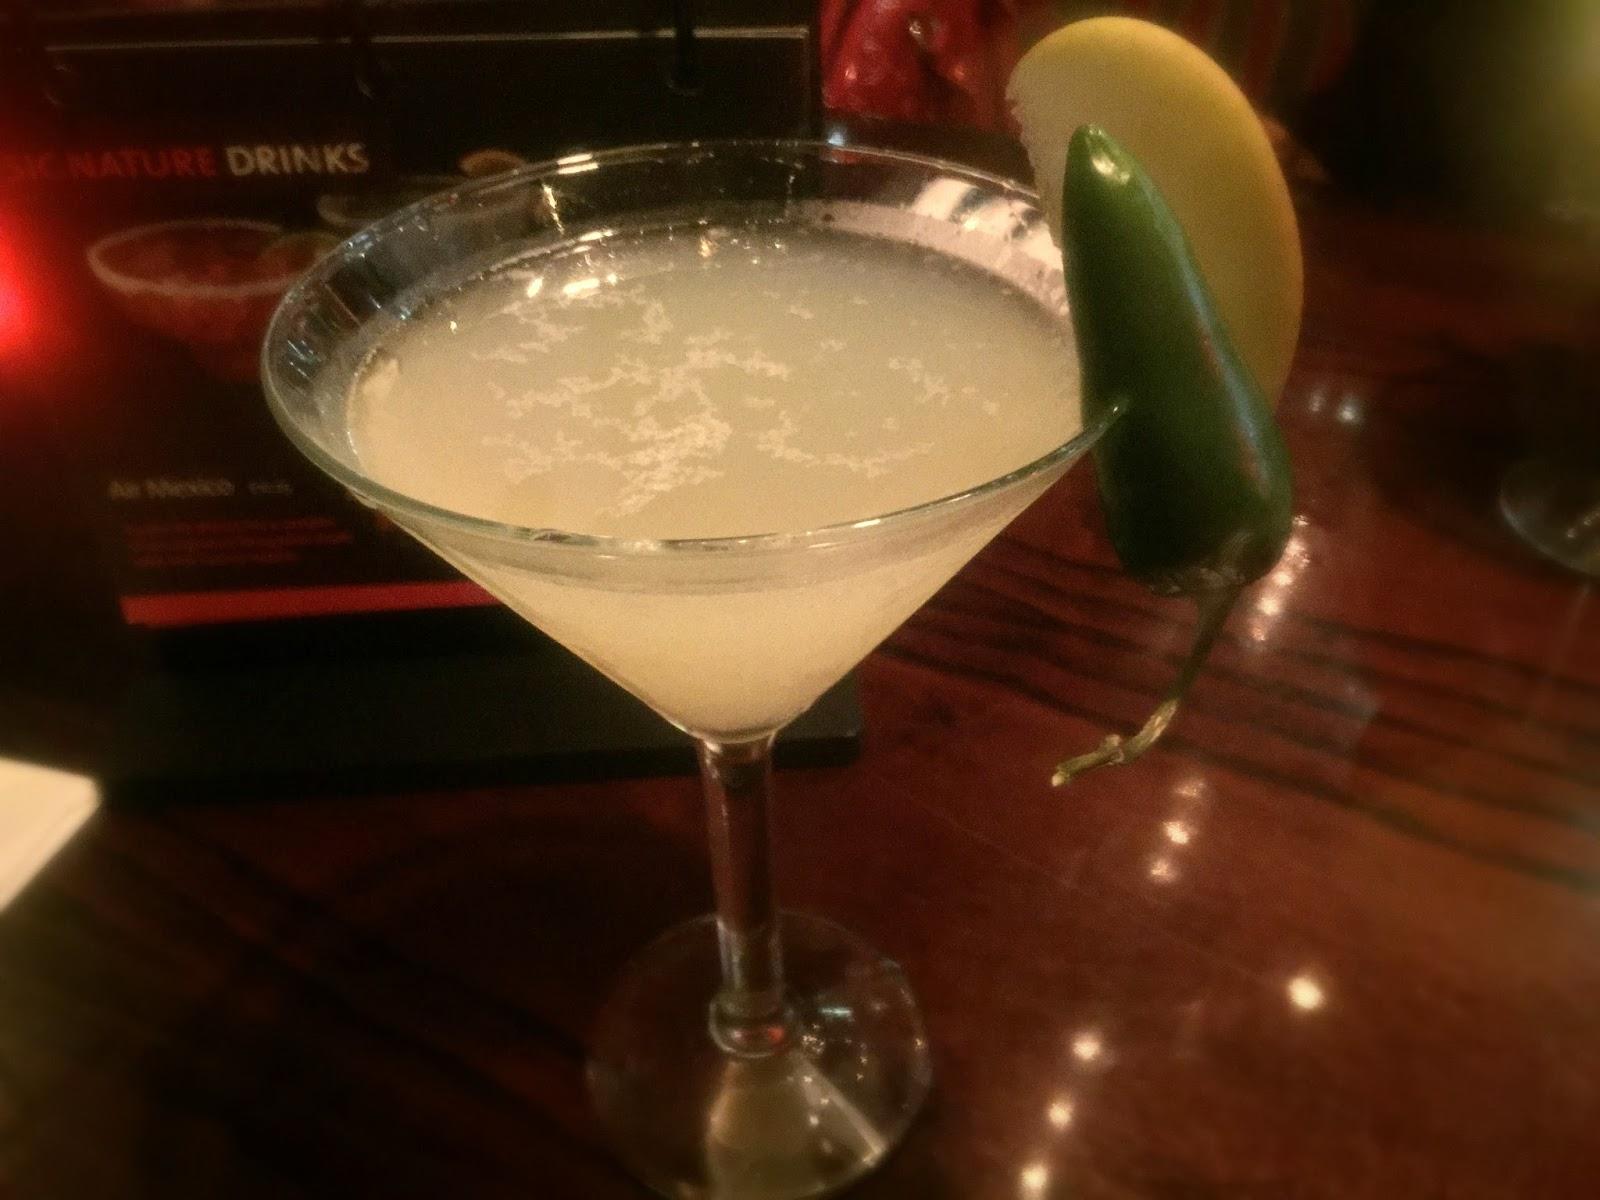 Formidable Joy | Formidable Joy Blog | Hard Rock Cafe | Food | National Chilli Week | National Chilli Week @ Hard Rock Cafe | Hard Rock Cafe London | Food Review | Apple Chilli Martini